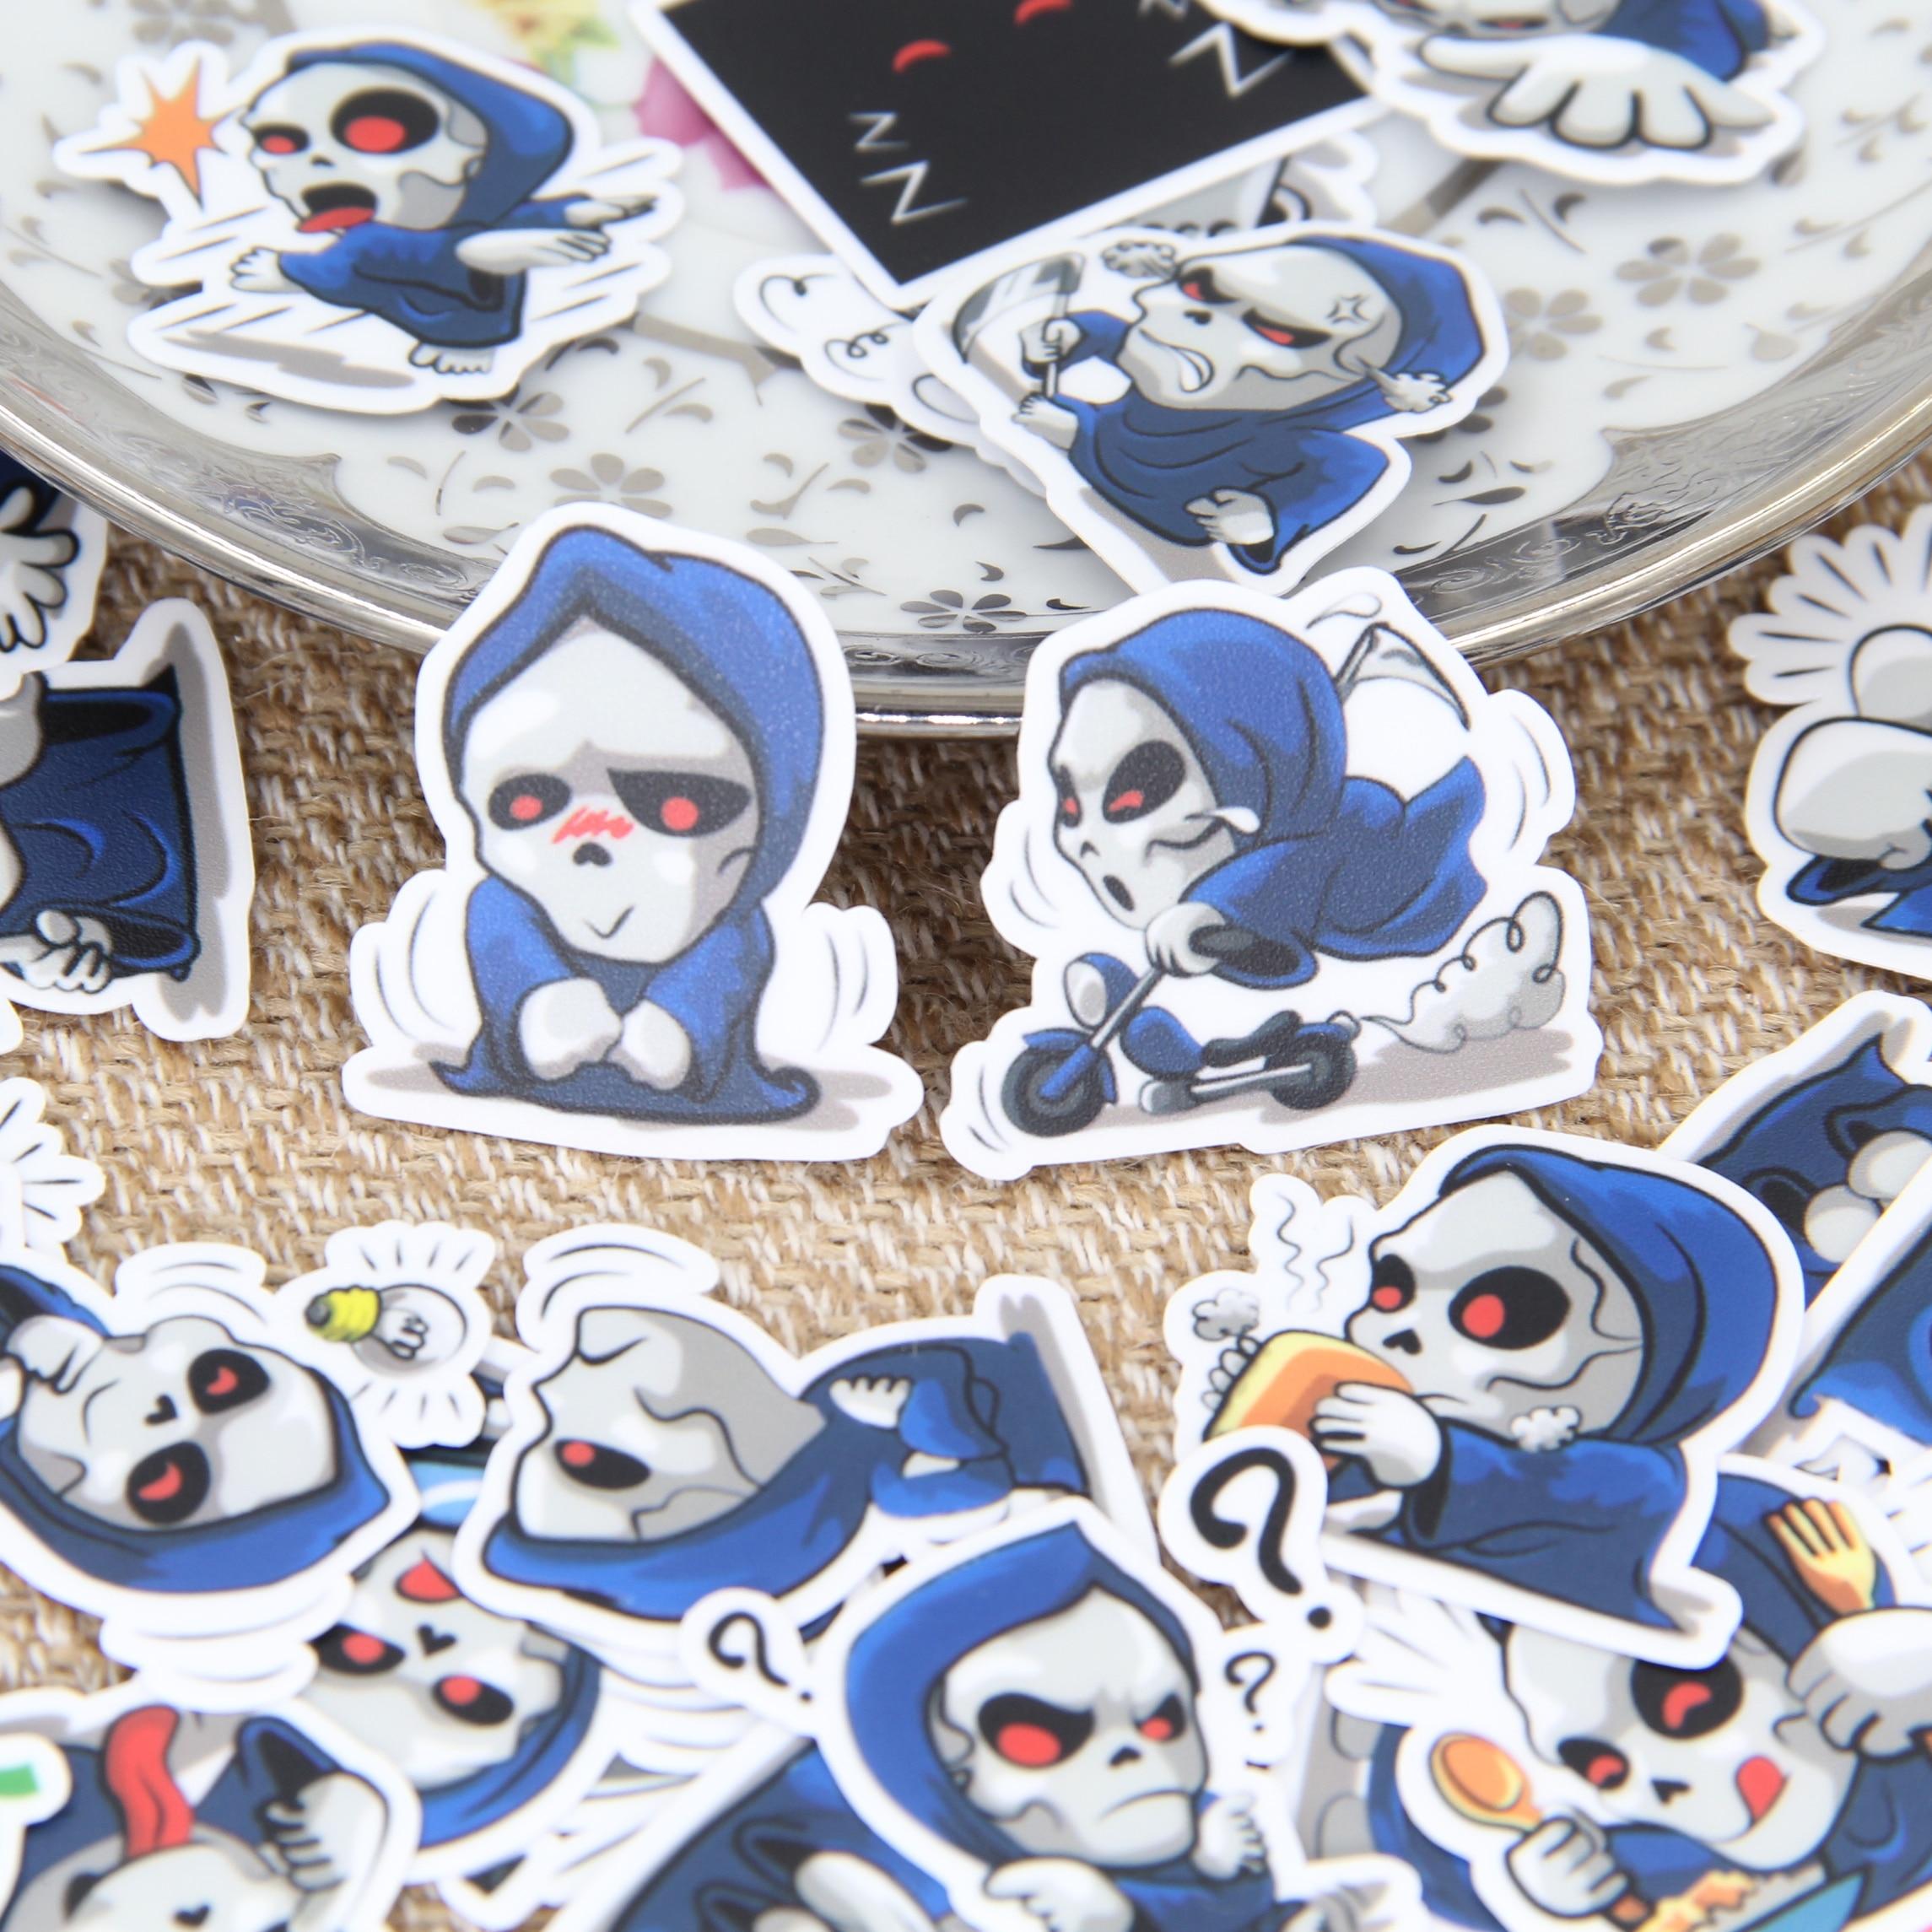 40pcs Self-made Funny Skull Skeletal Men  Scrapbooking Stickers DIY Craft Decrative Sticker Pack Book Deco Diary Deco